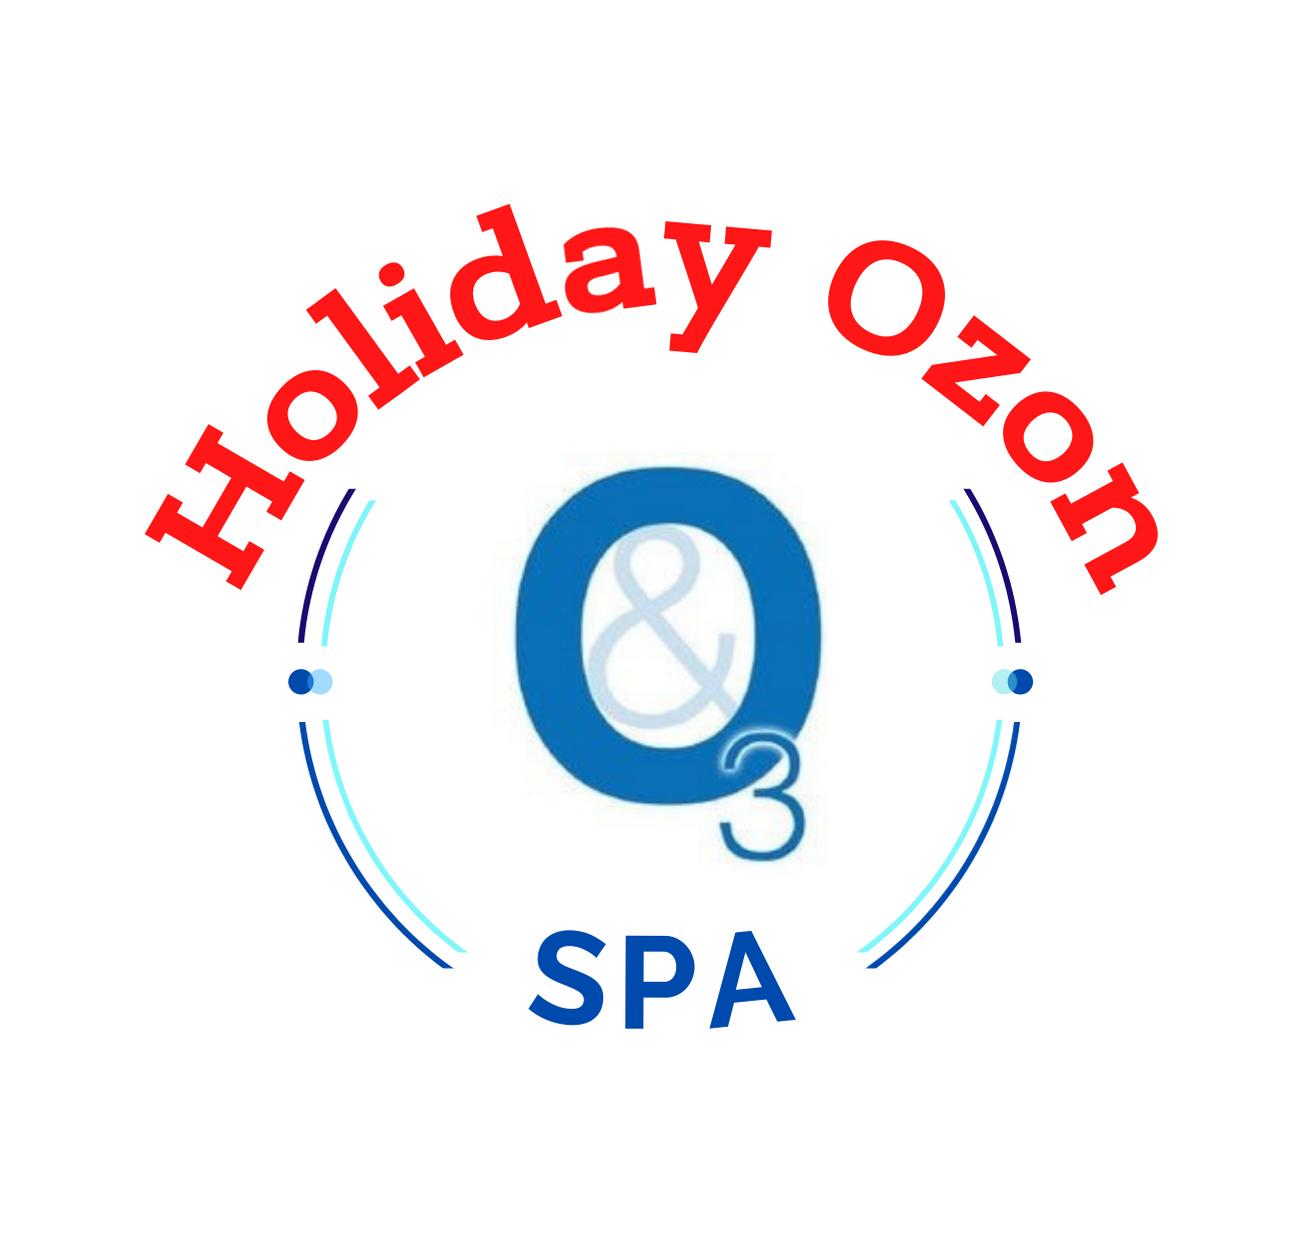 Holiday OZON-SPA